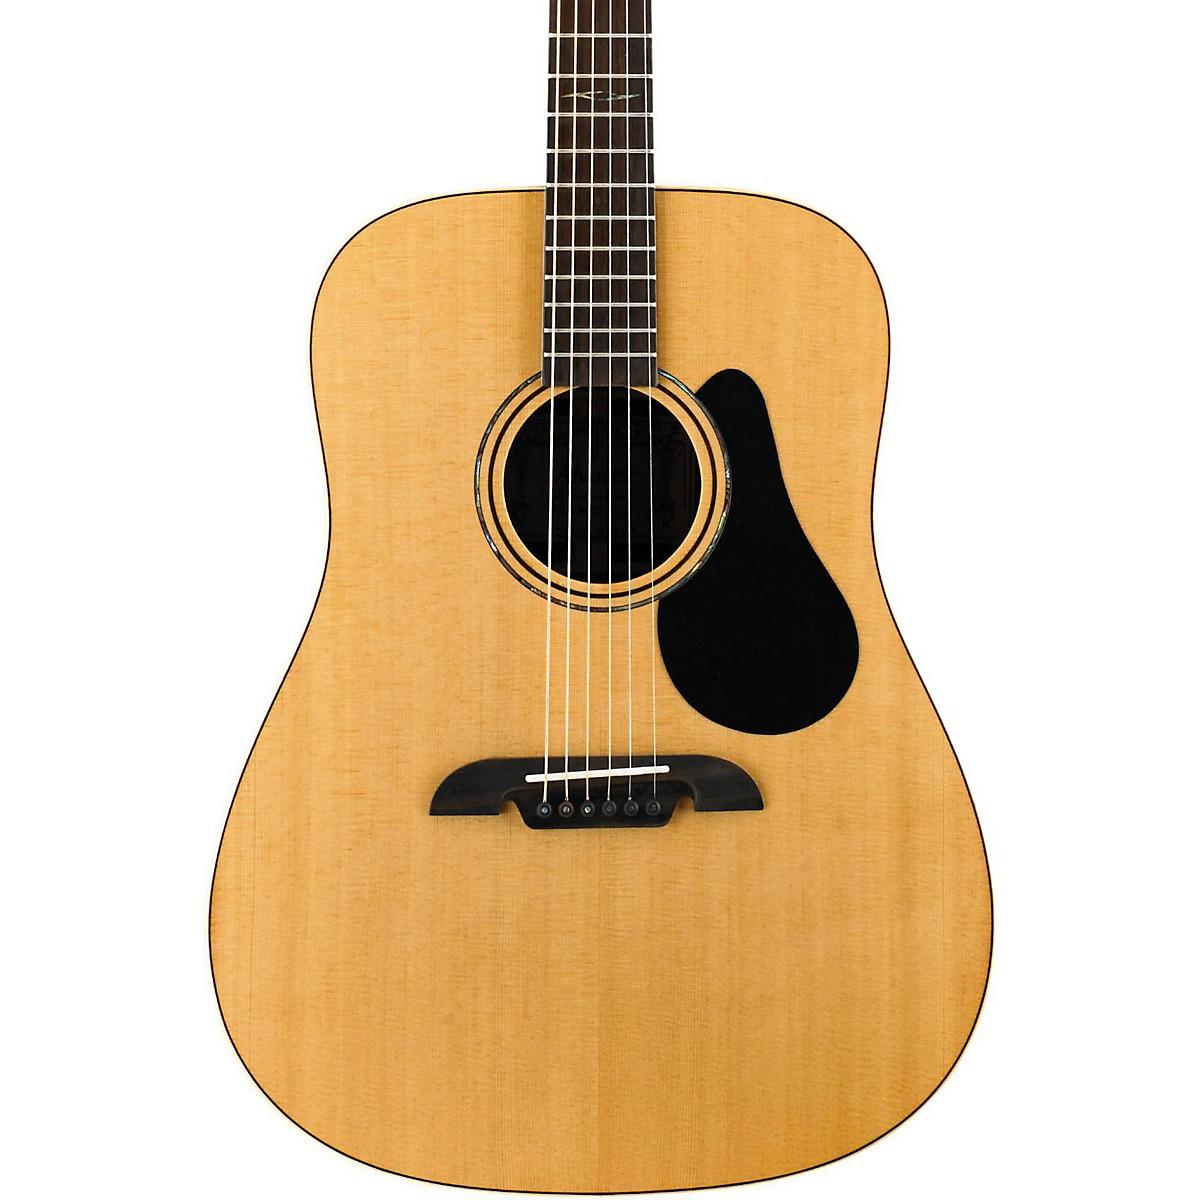 Alvarez Masterworks Series MD70 Dreadnought Acoustic Guitar